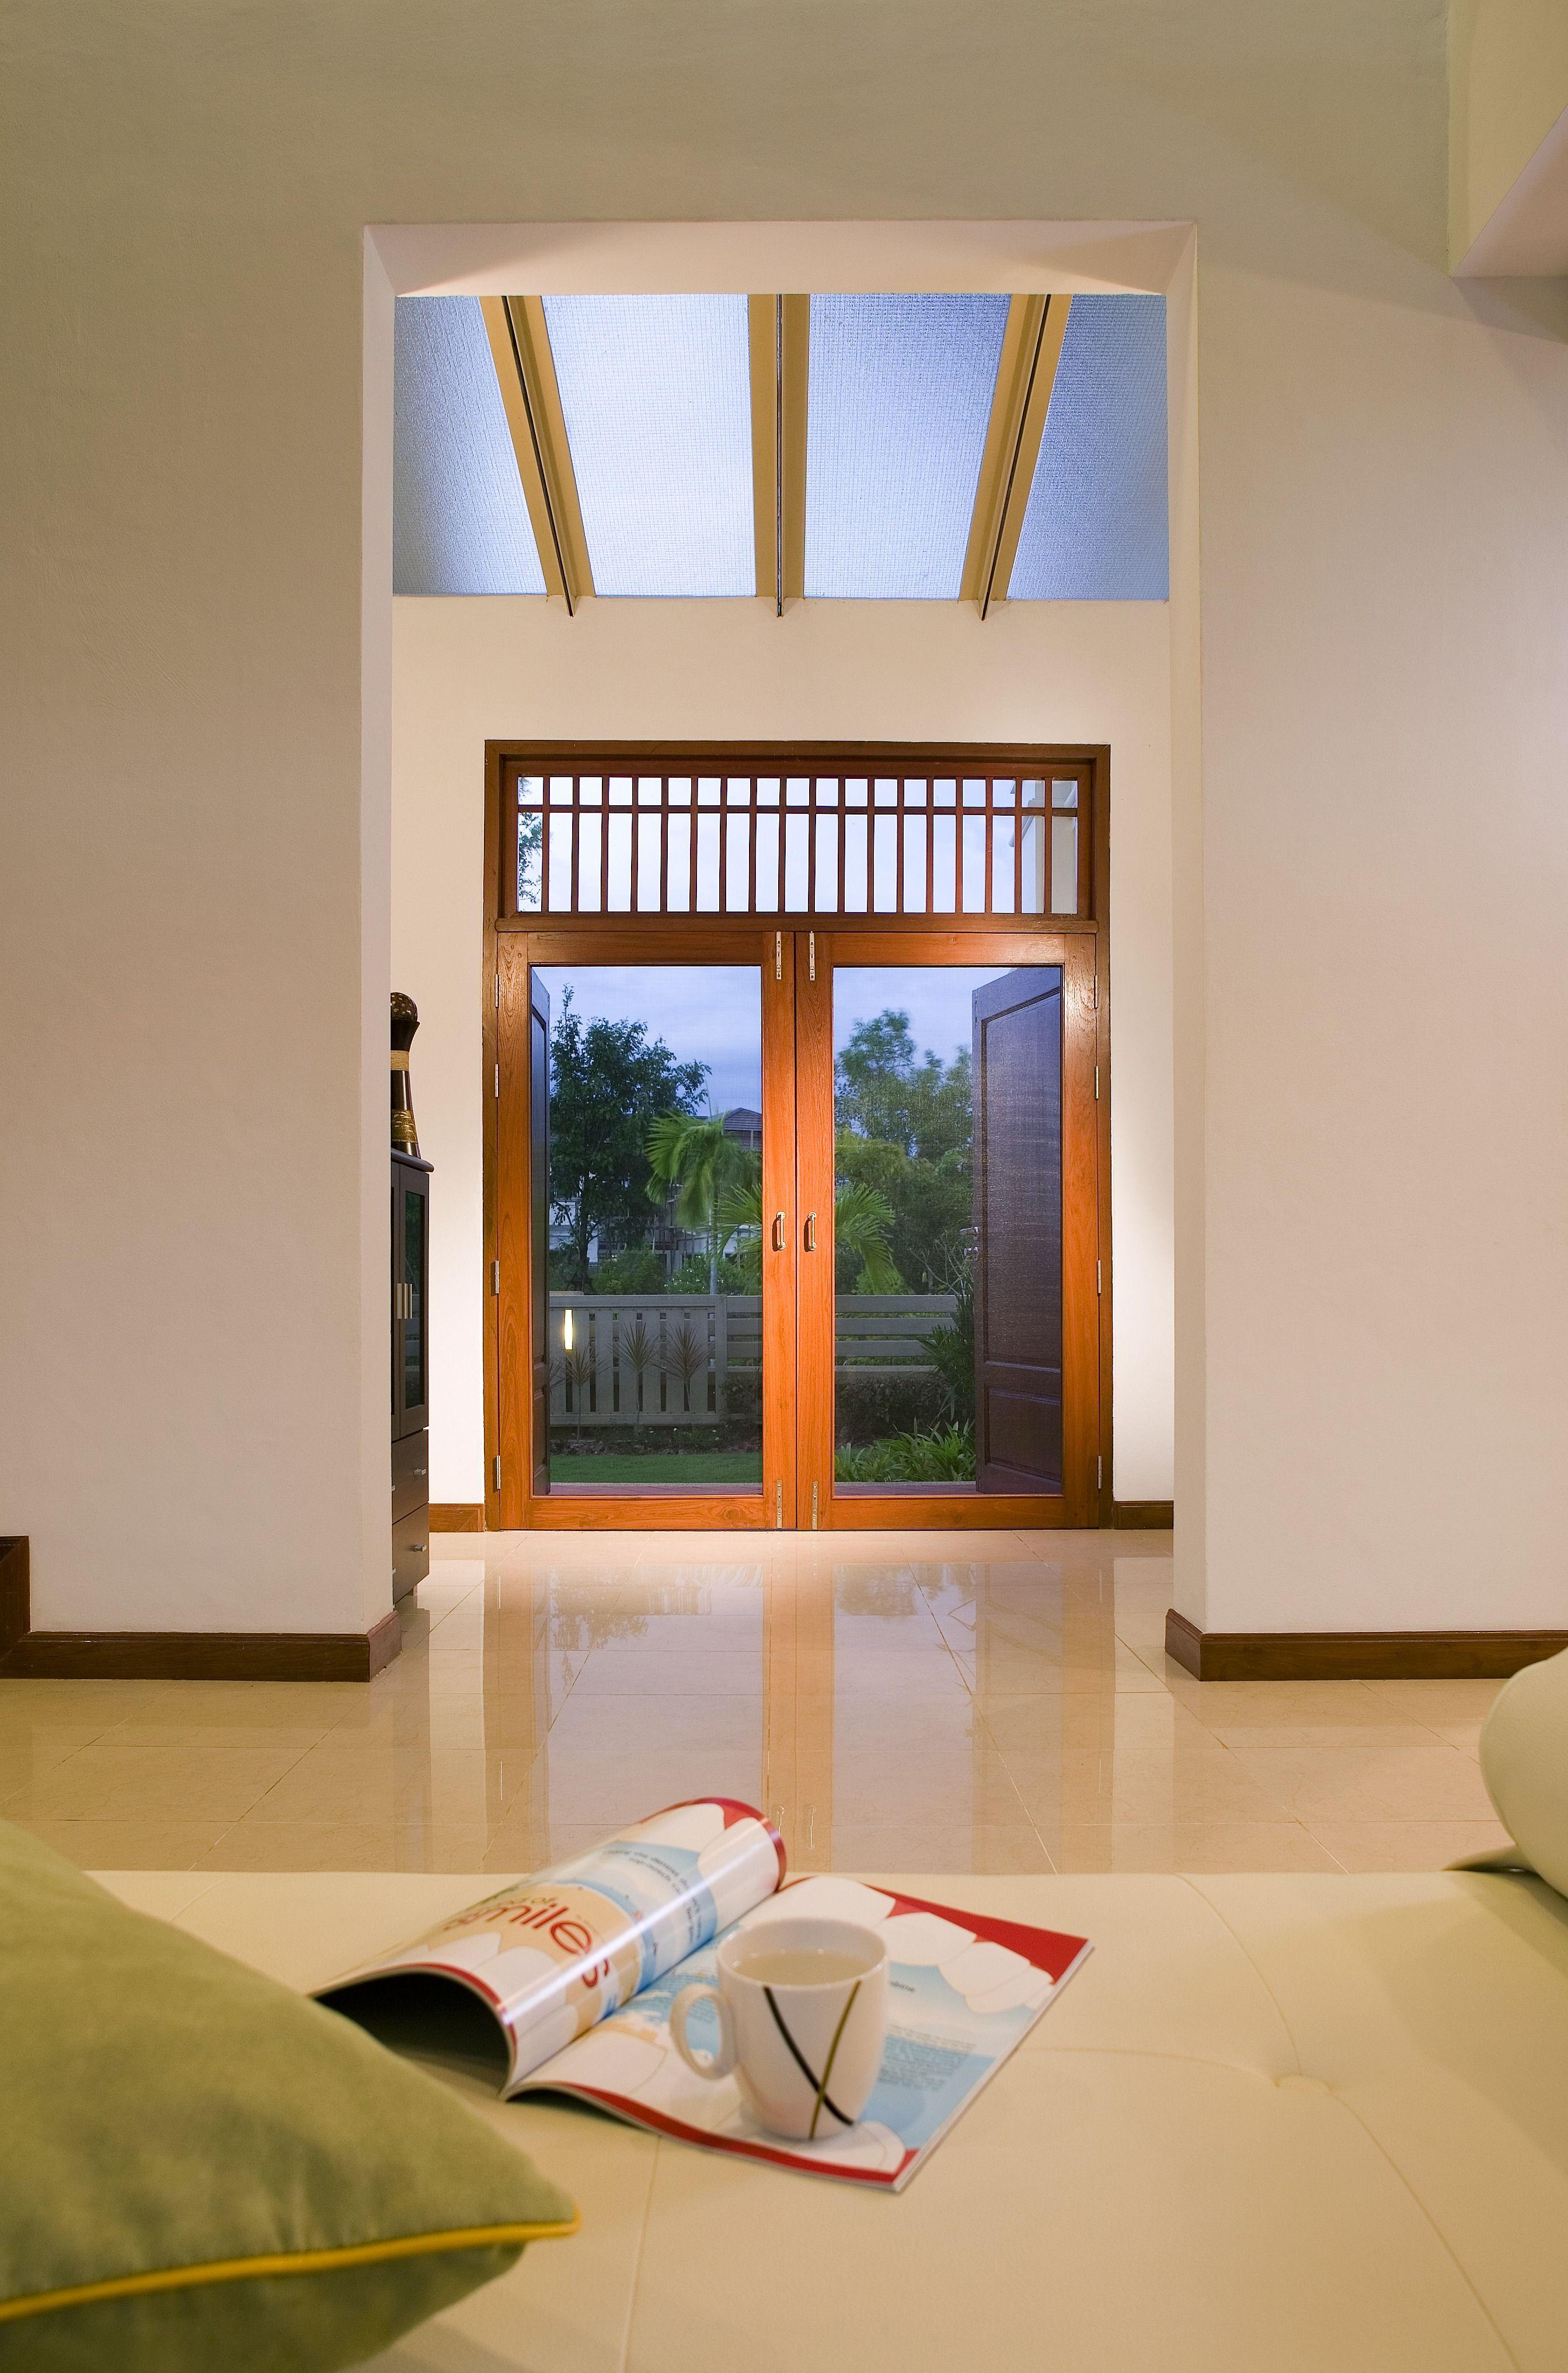 2020 Home Doors Windows Prices Bay Windows Sliding Doors Front Doors Skylight Installation Window Prices Home